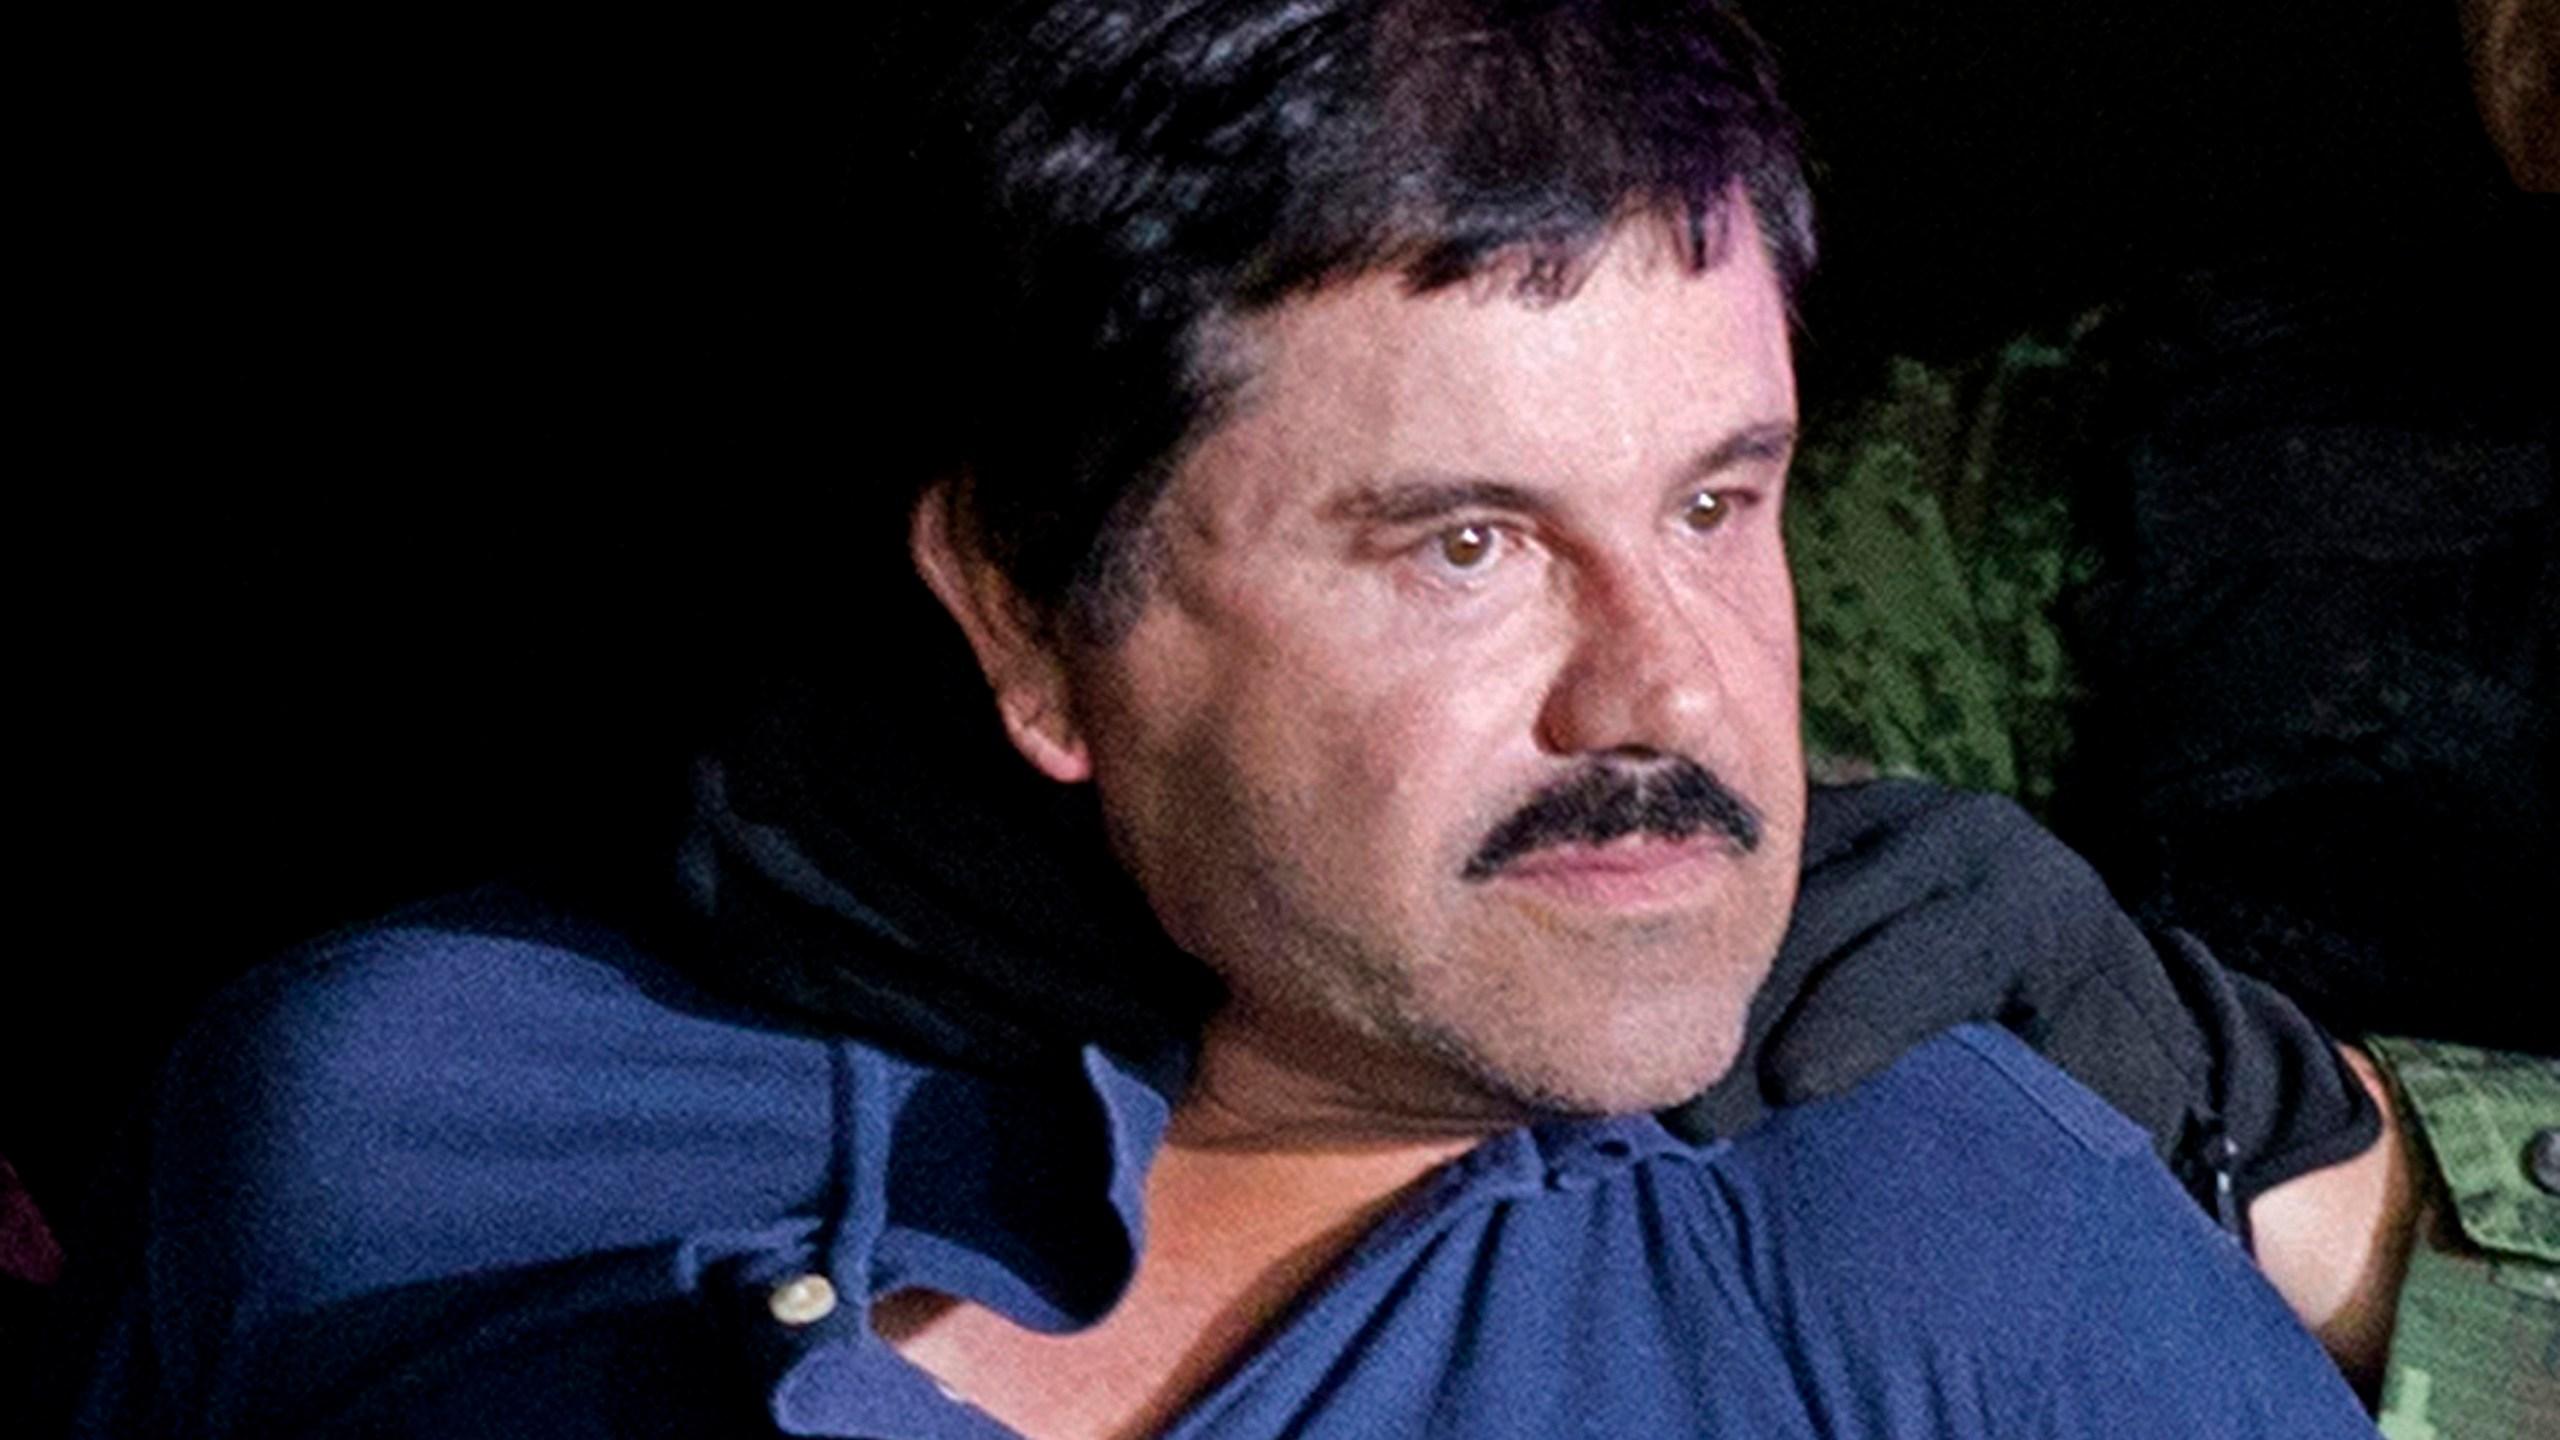 El_Chapo_Prosecution_22246-159532.jpg02457457